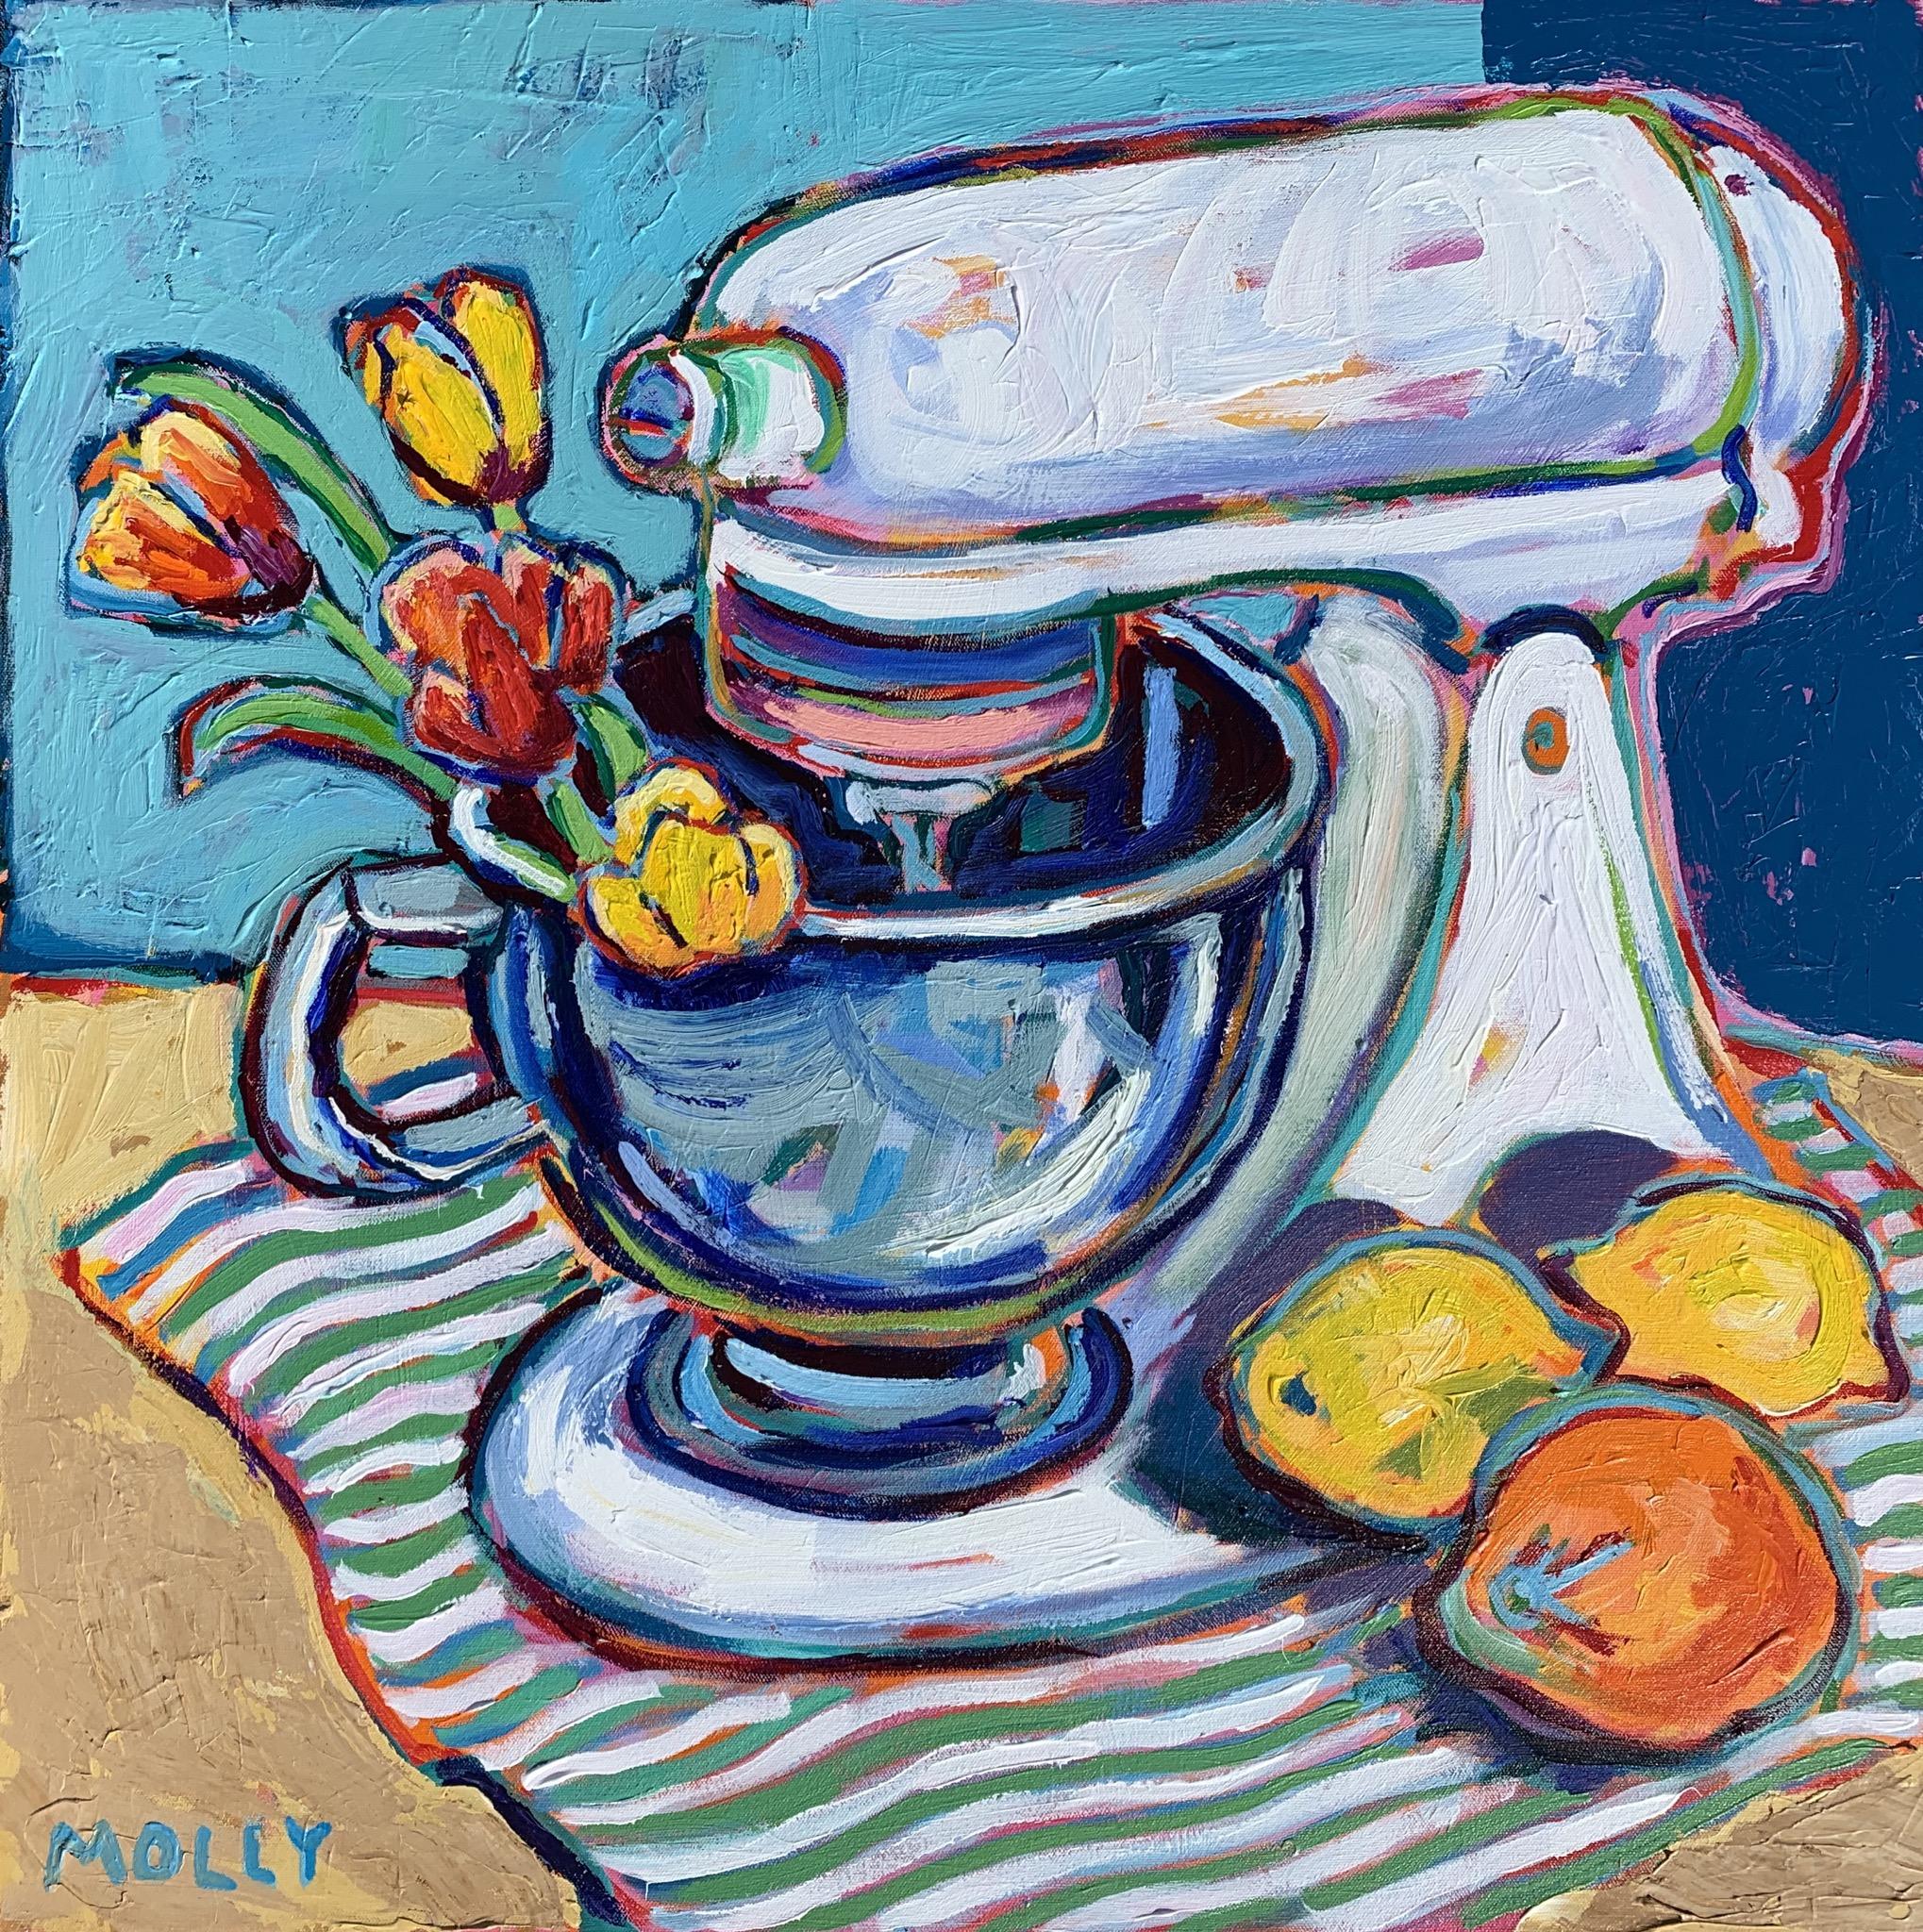 Bake with Me #2, 30x30, Acrylic on Canvas